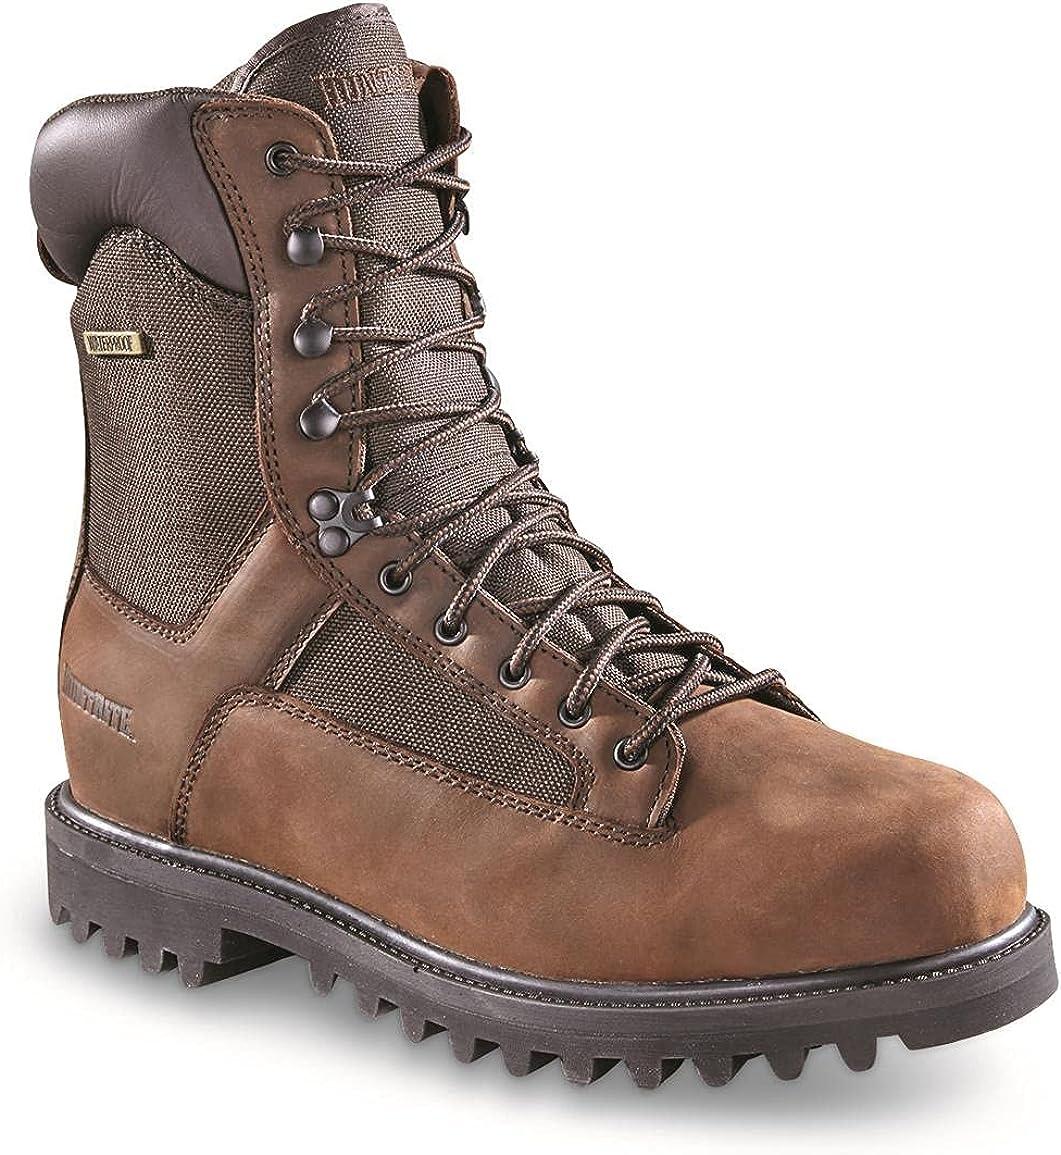 Huntrite Men's Insulated Genuine Waterproof Hunting Super popular specialty store 800-gram Boots